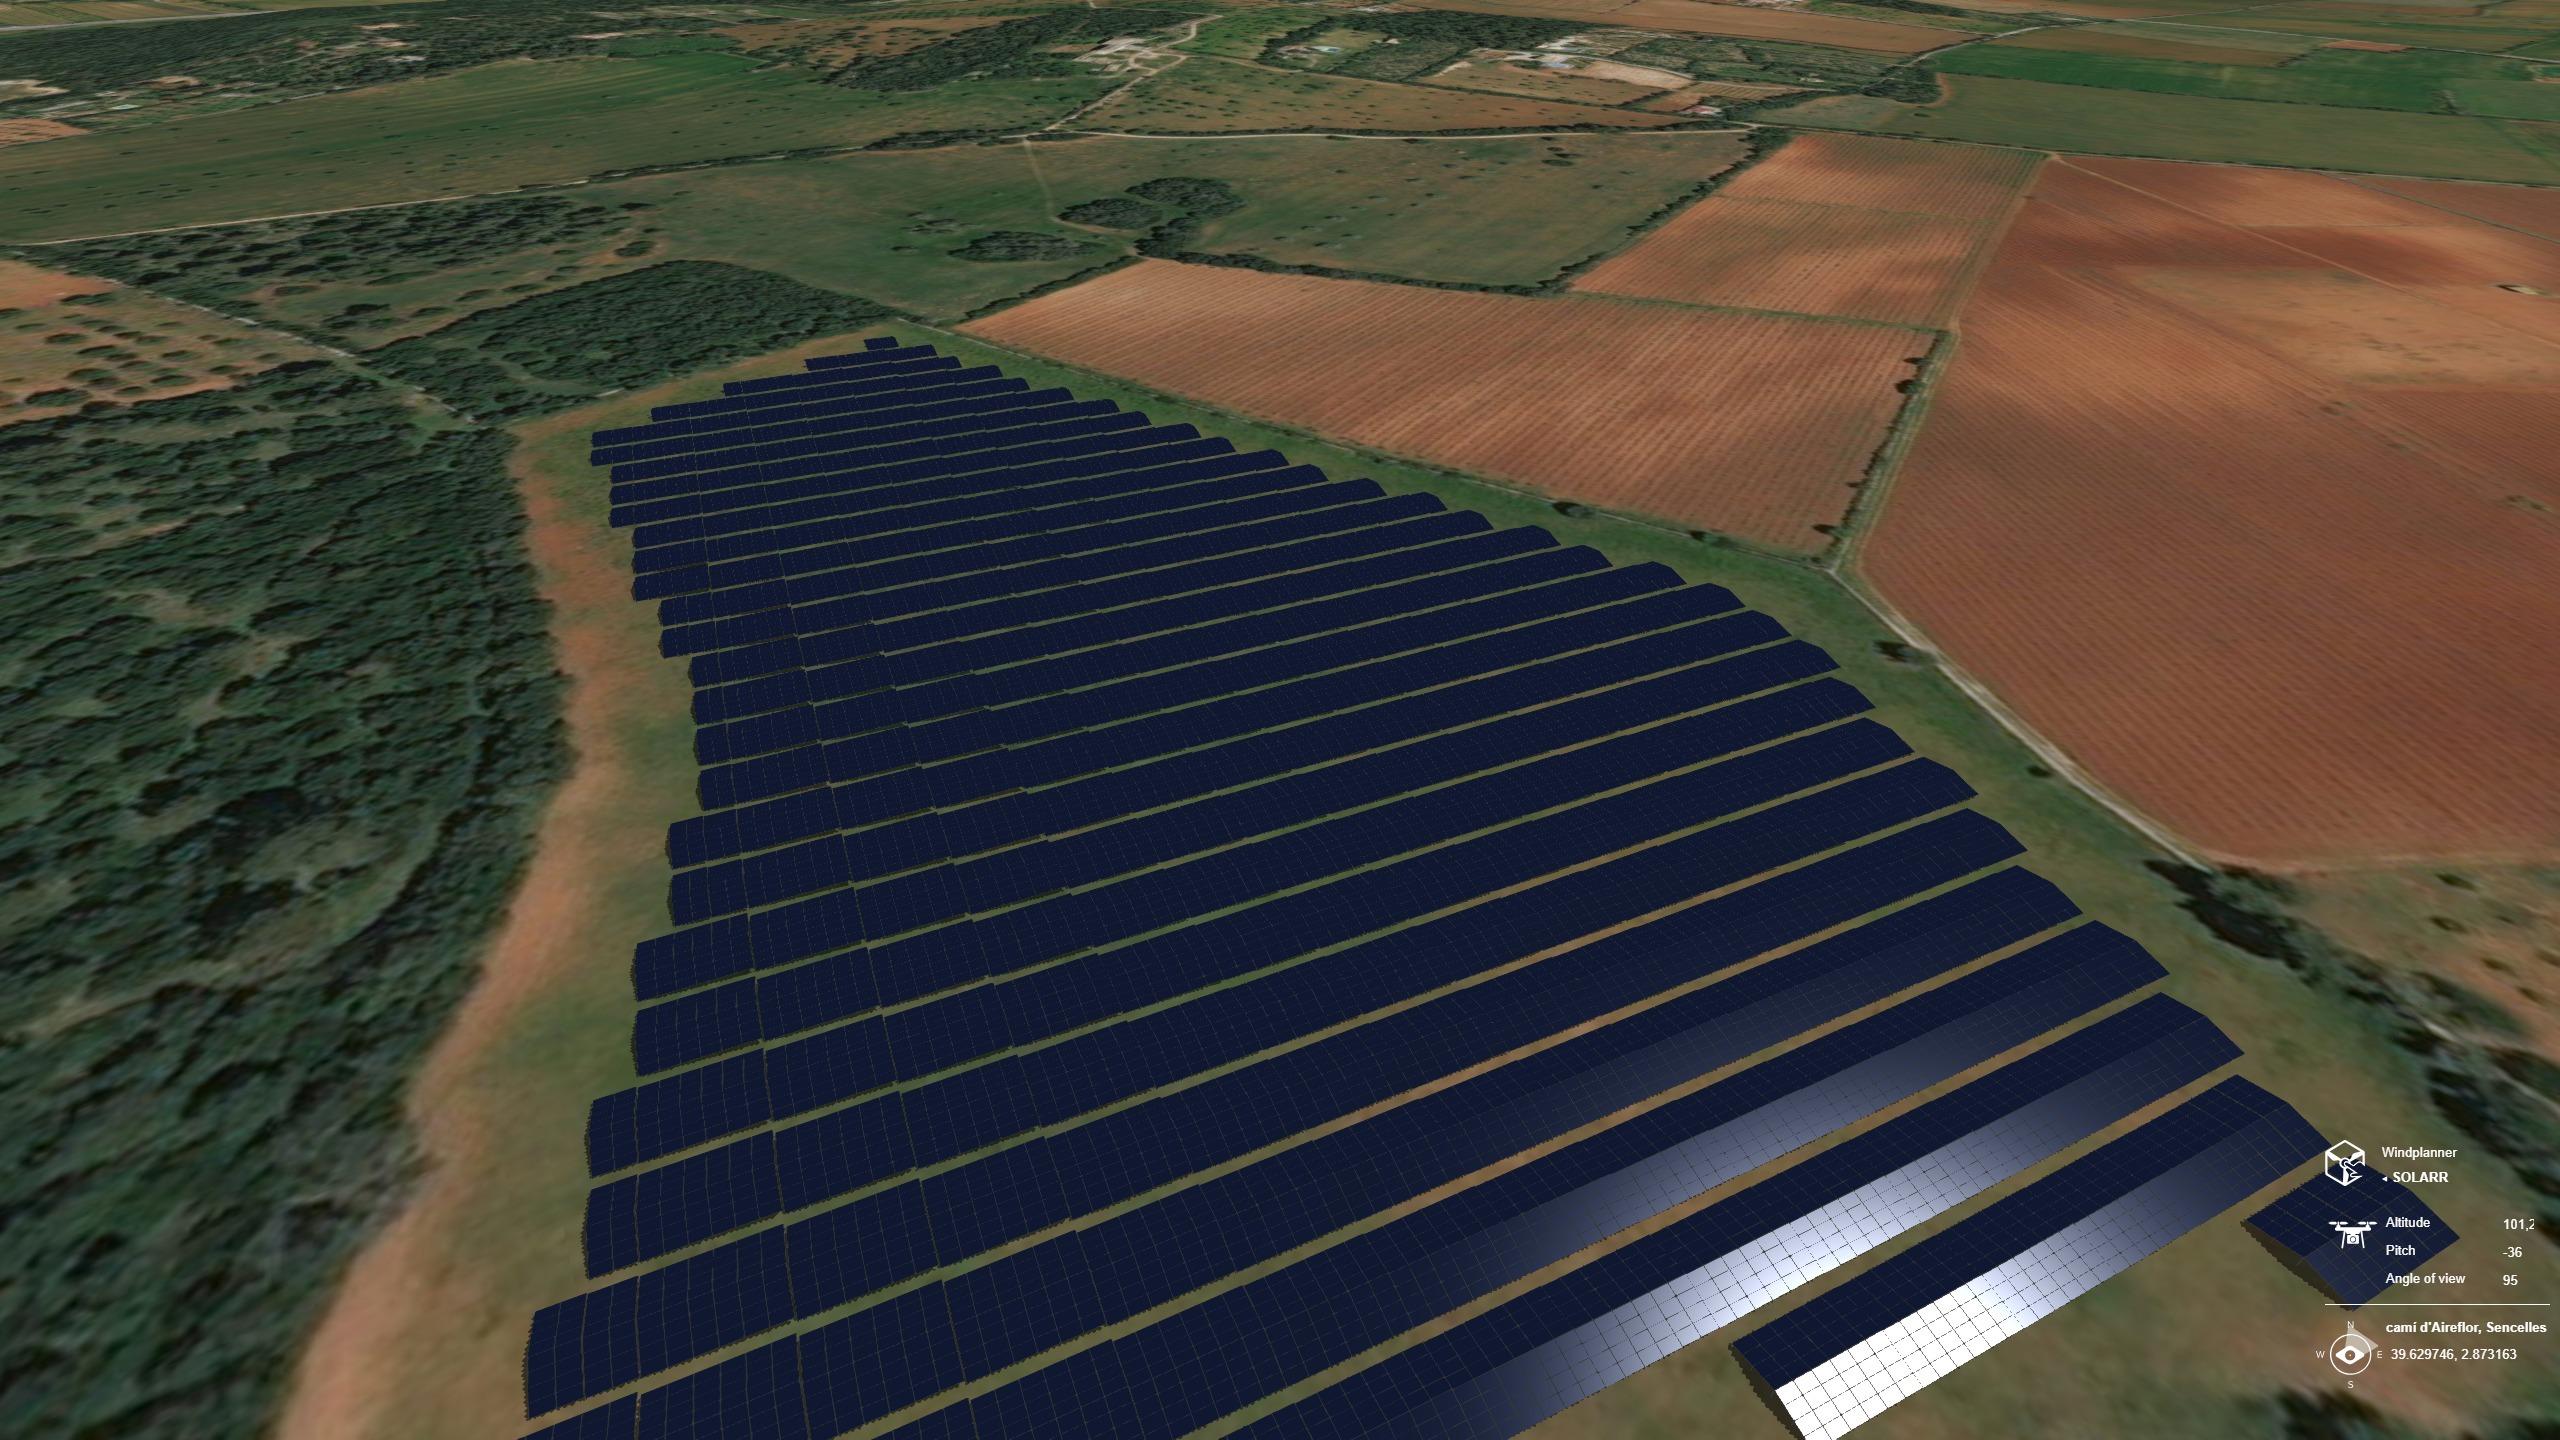 Solarplanner module